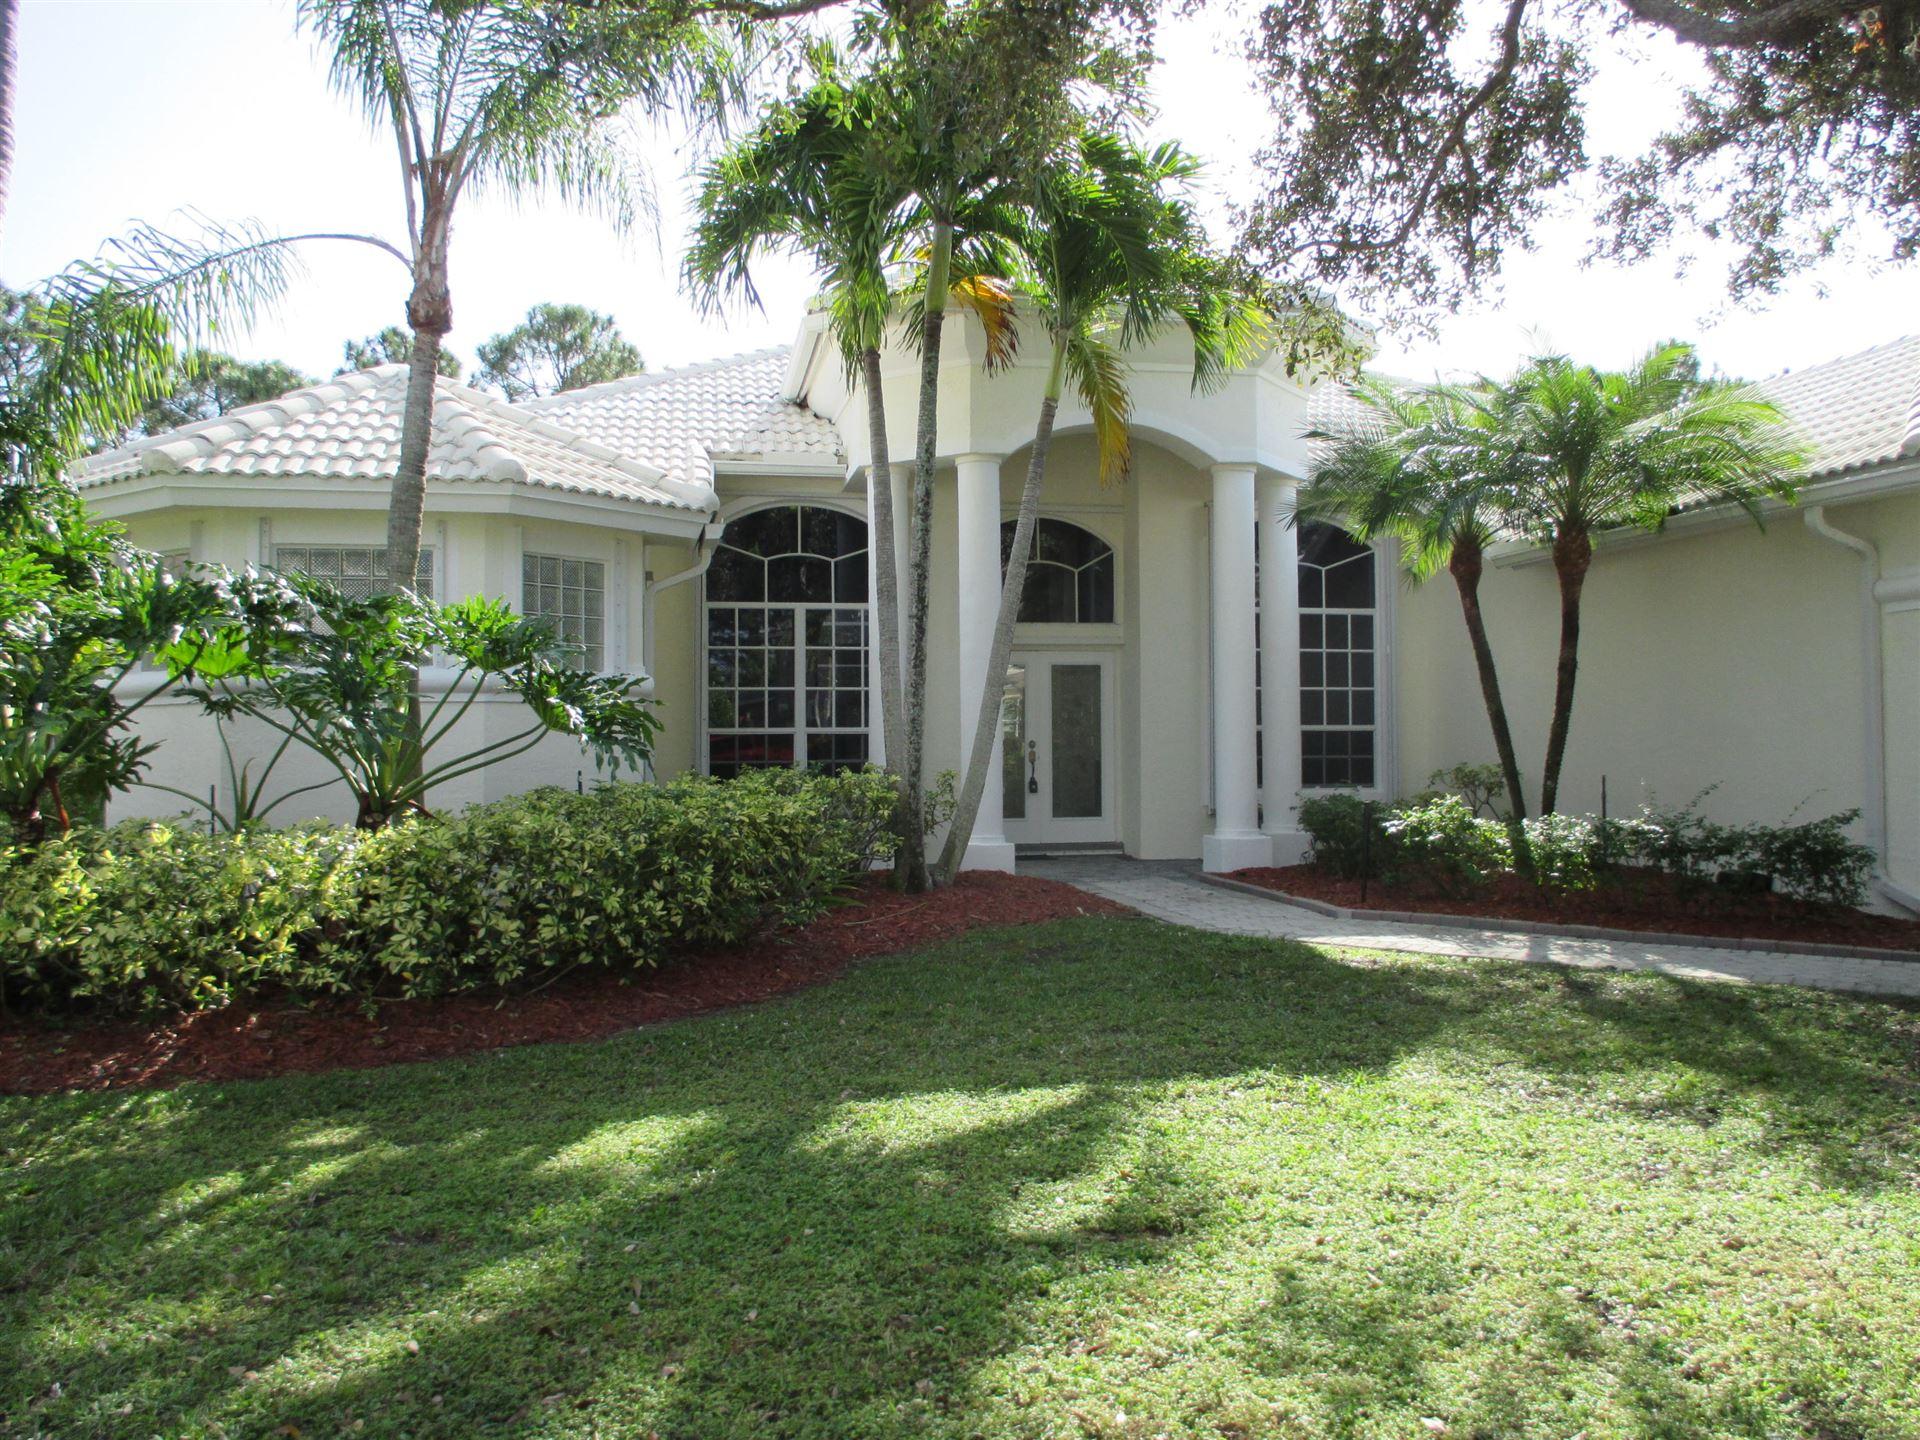 3512 SE Fairway Oaks Trail, Stuart, FL 34997 - #: RX-10628248